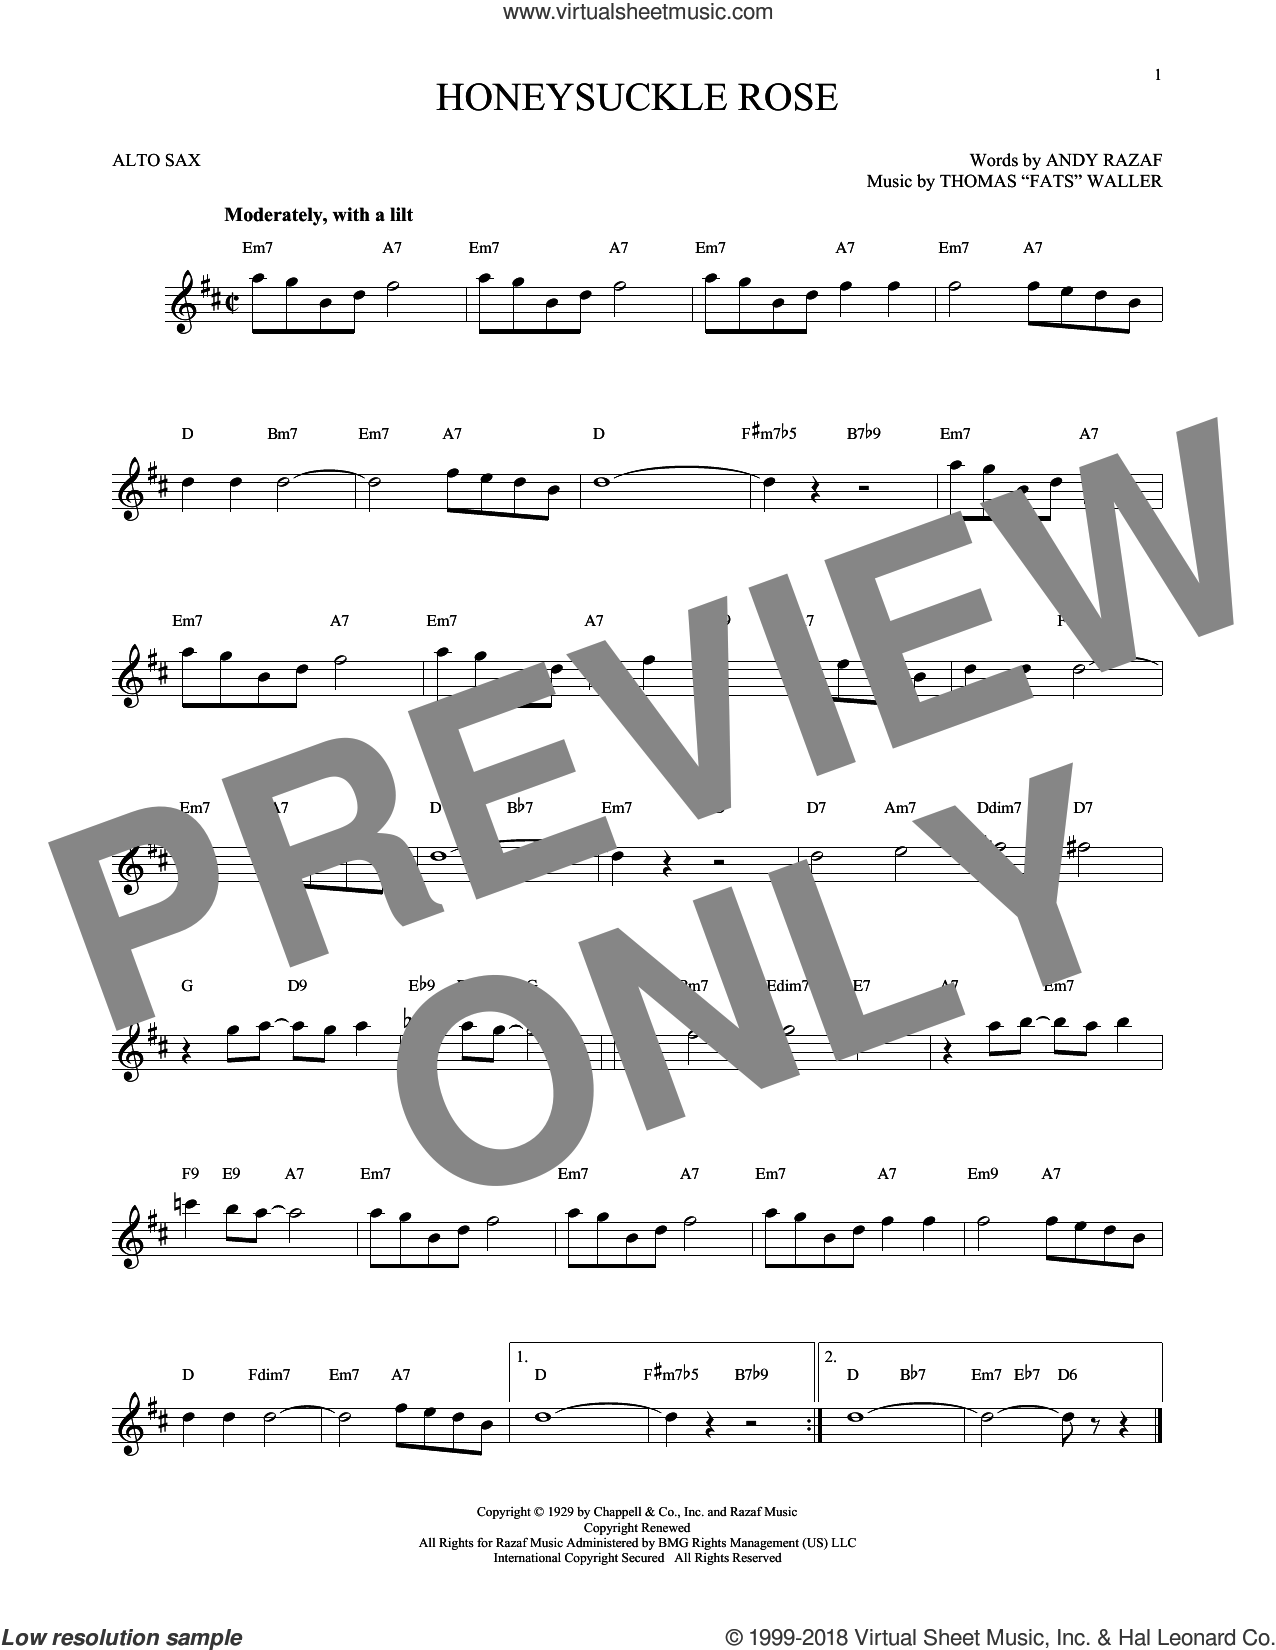 Honeysuckle Rose sheet music for alto saxophone solo by Andy Razaf, Django Reinhardt and Thomas Waller, intermediate skill level